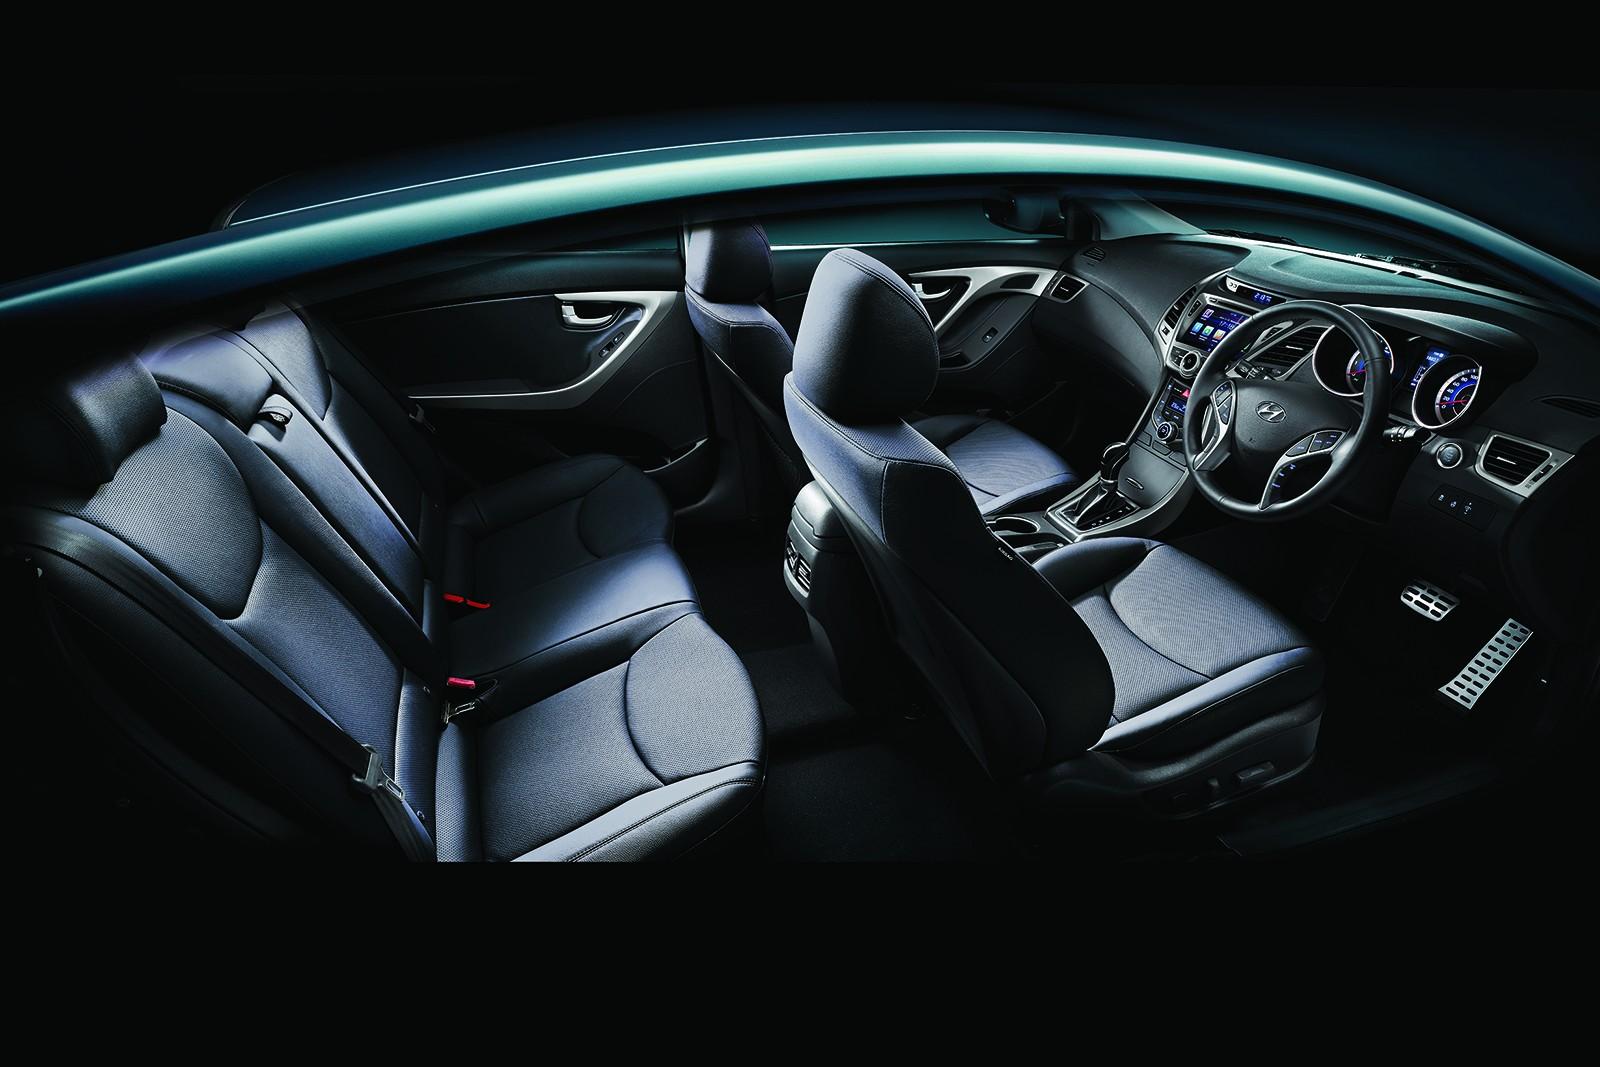 Huynhdai Elantra facelift